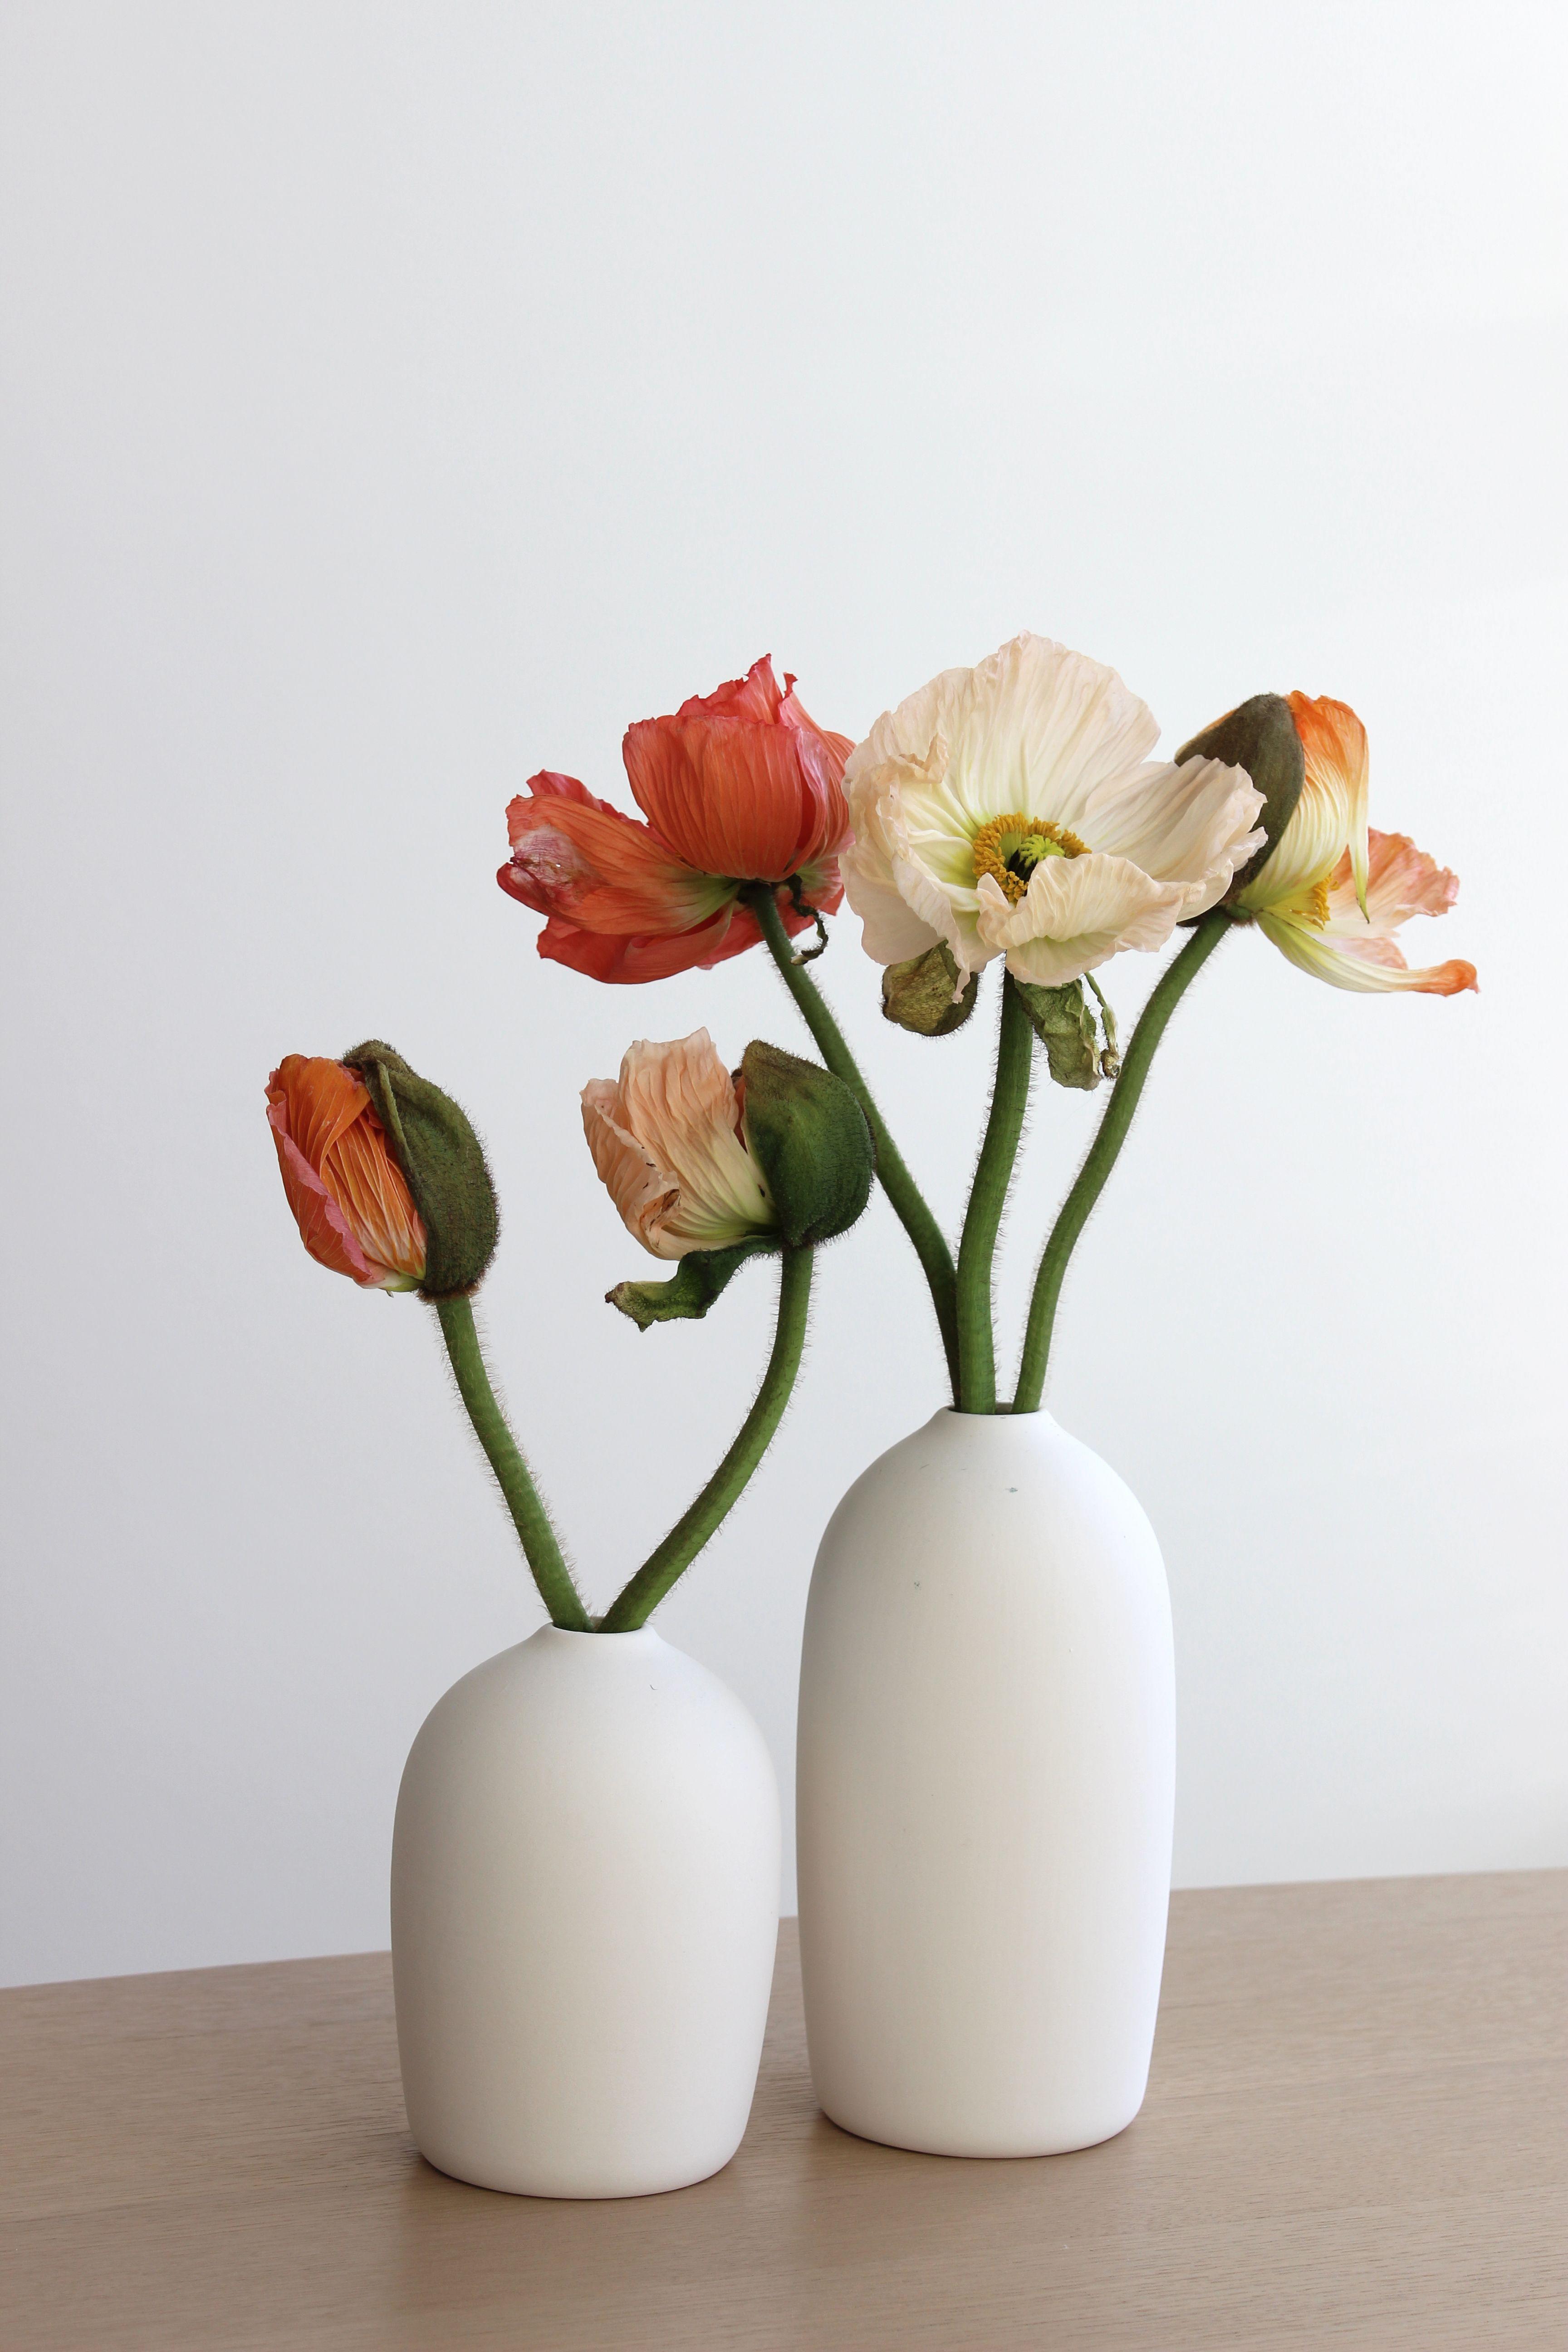 Raw Vase White Large Hvid Keramikvase In 2020 Small Flower